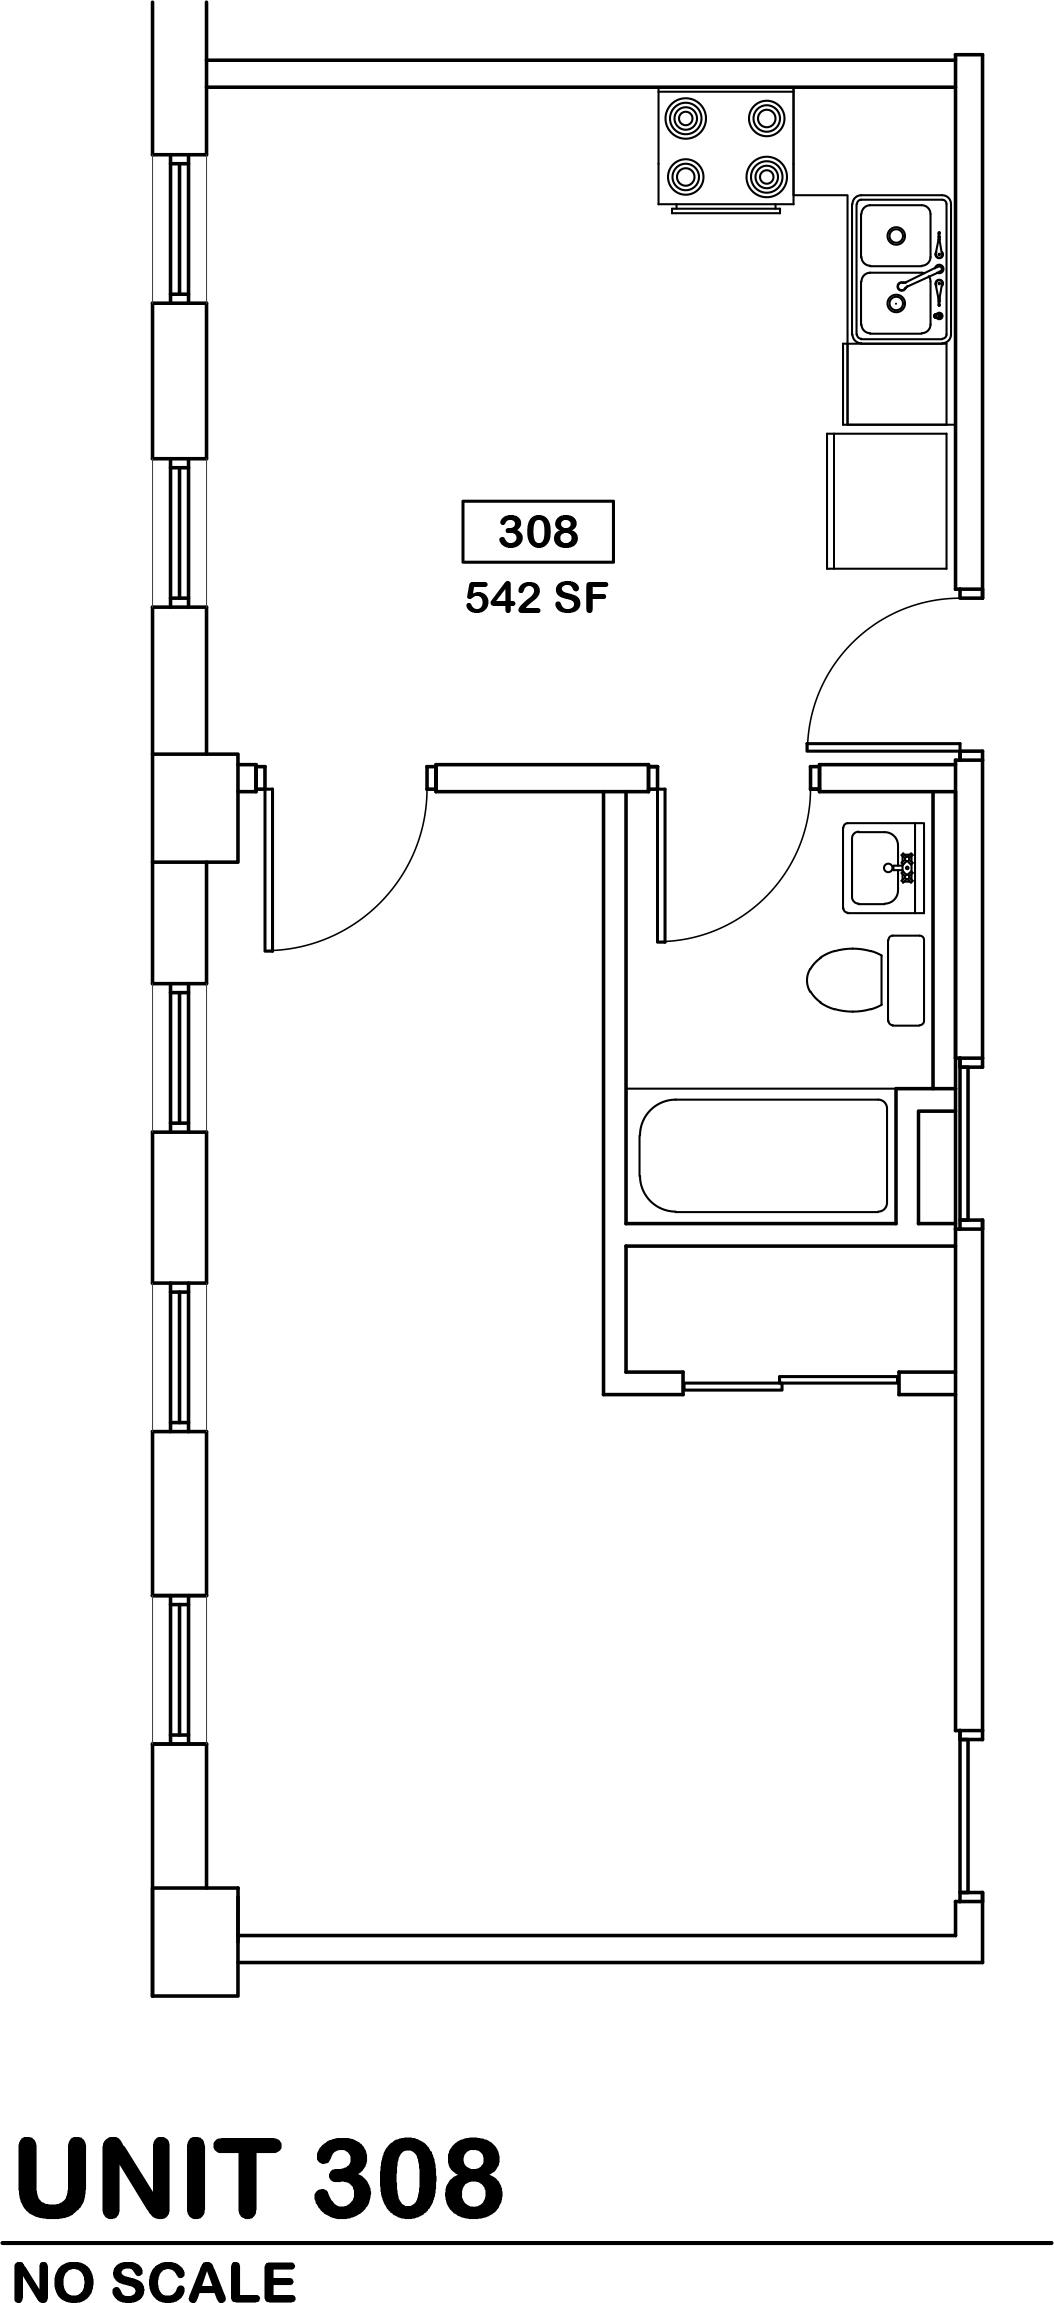 studio  $610 / 542 sq ft